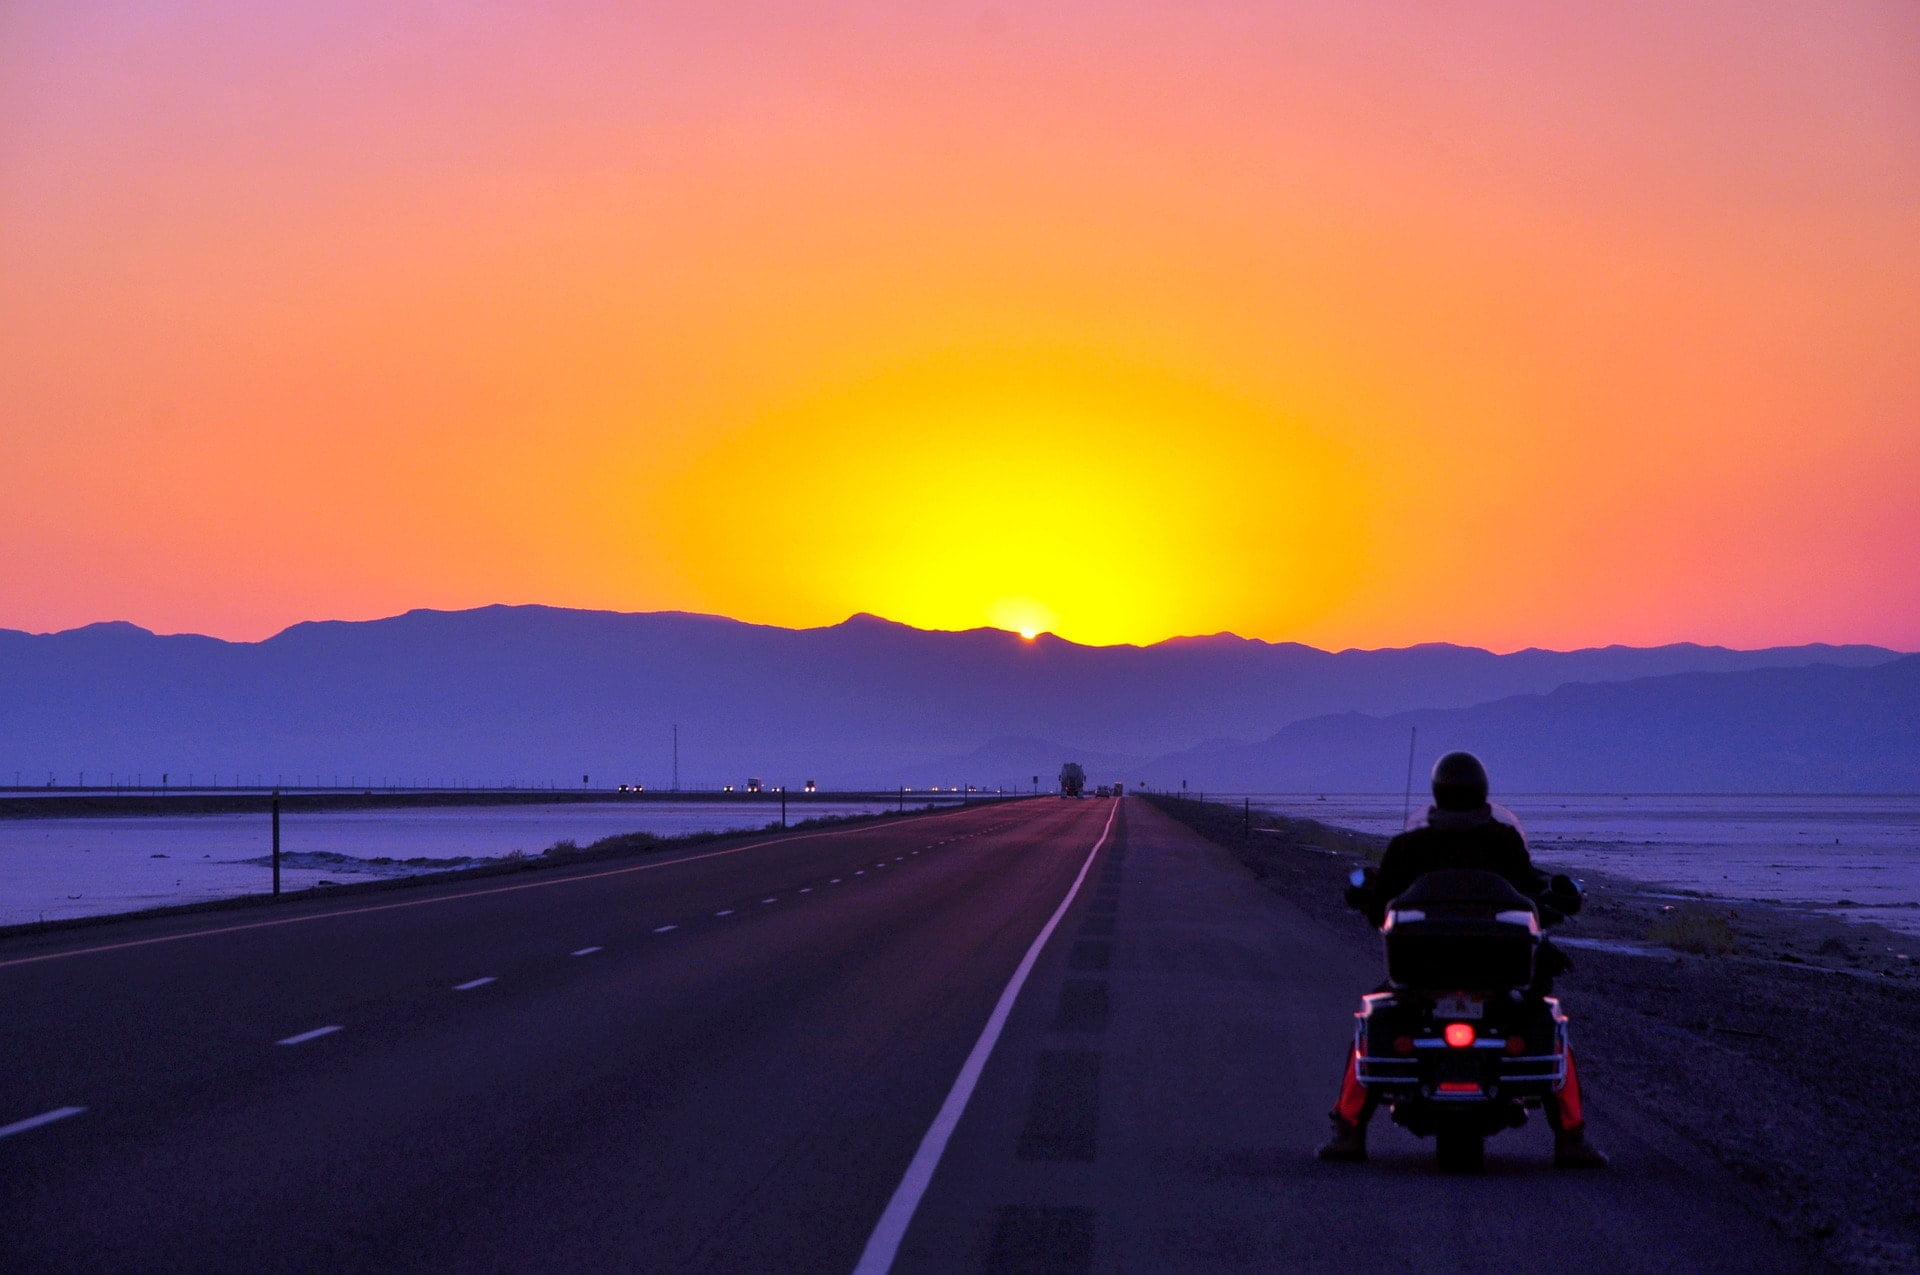 motorbike sunset roadtrip quotes